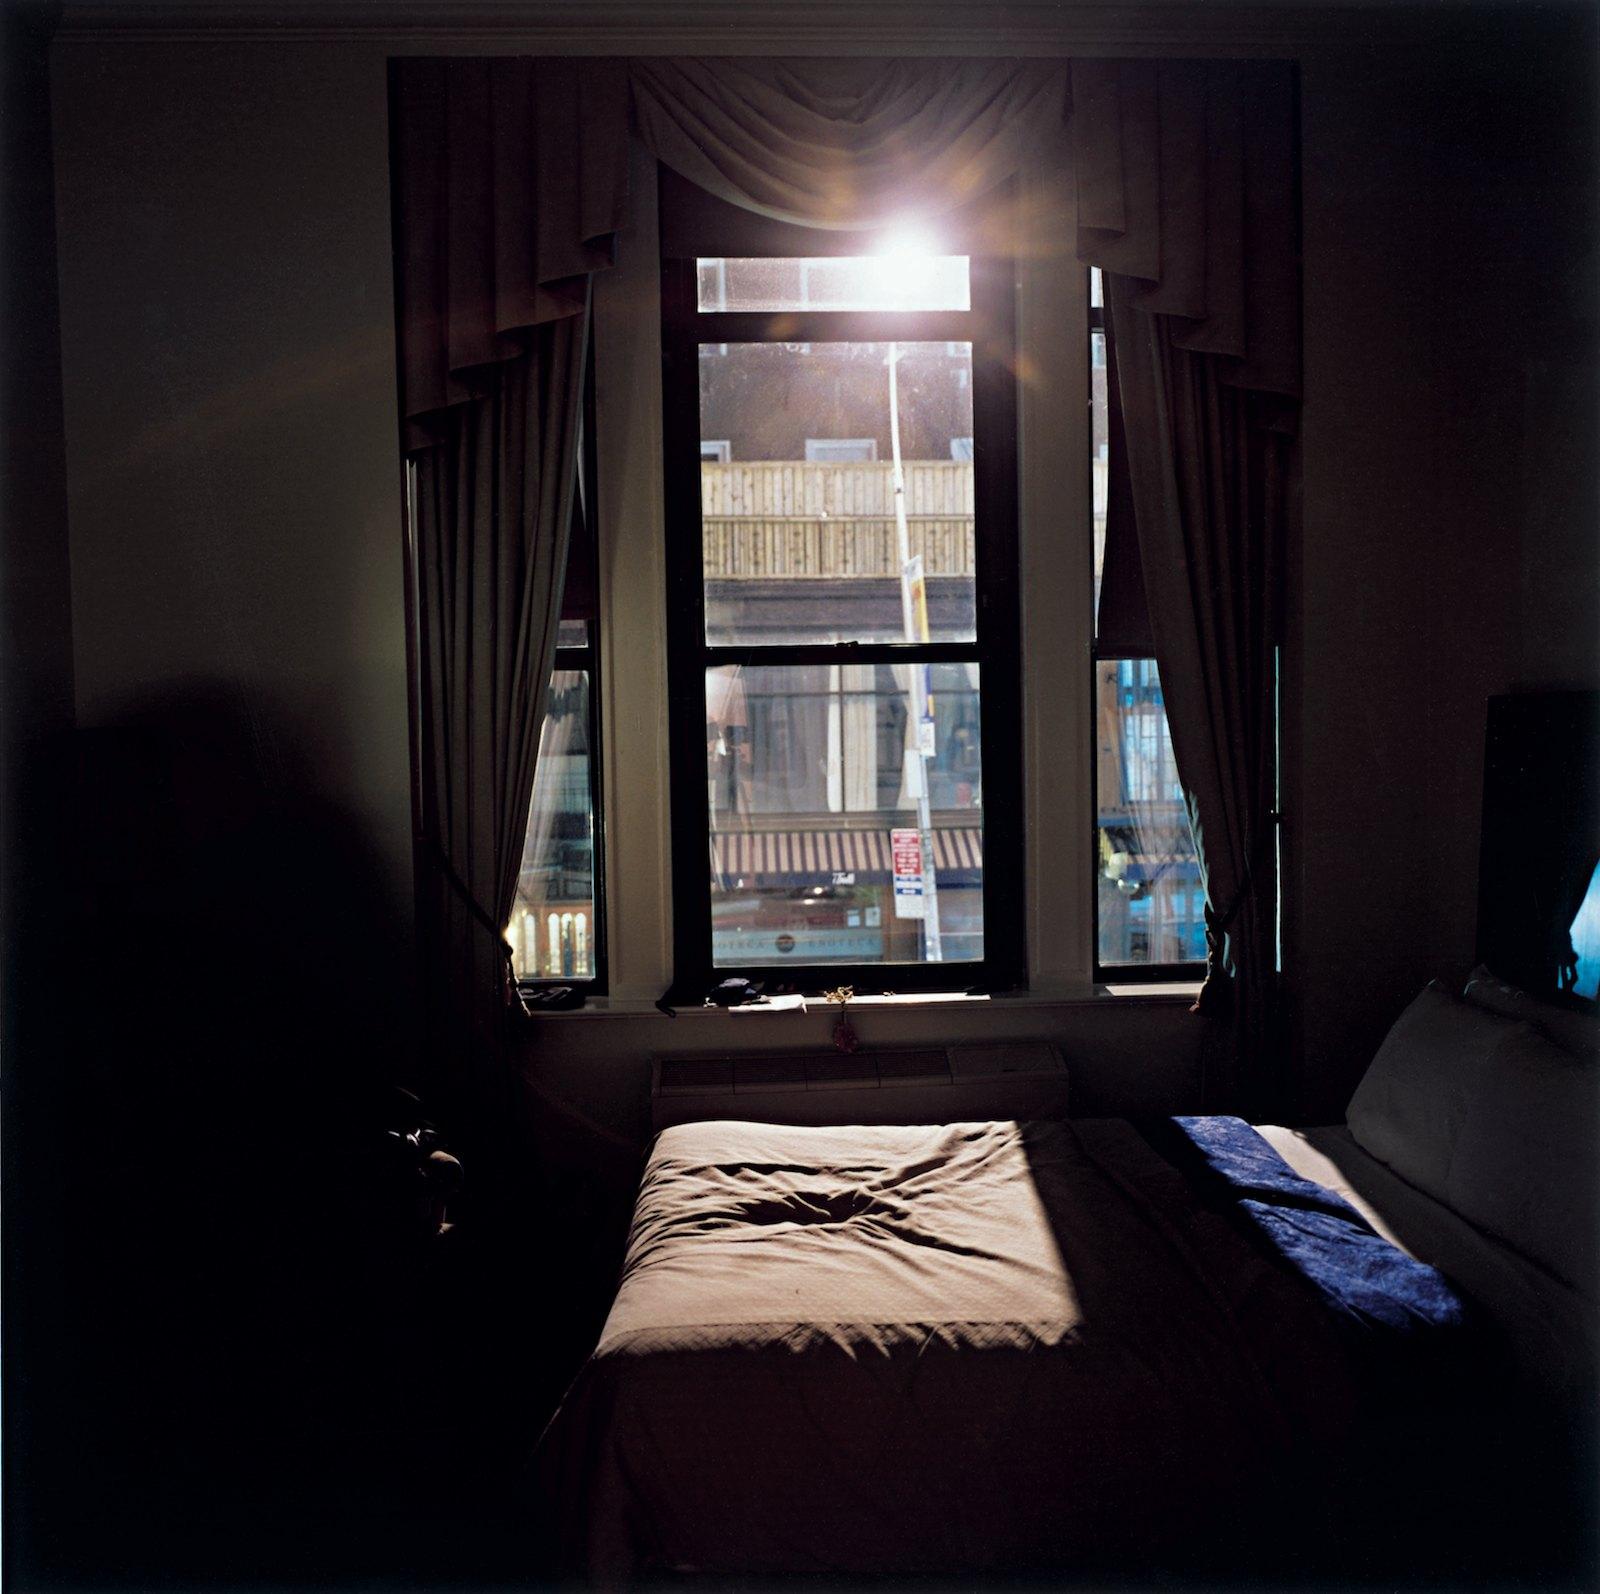 Park South Hotel 24:52, 2008, C-print, 100 x 100 cm